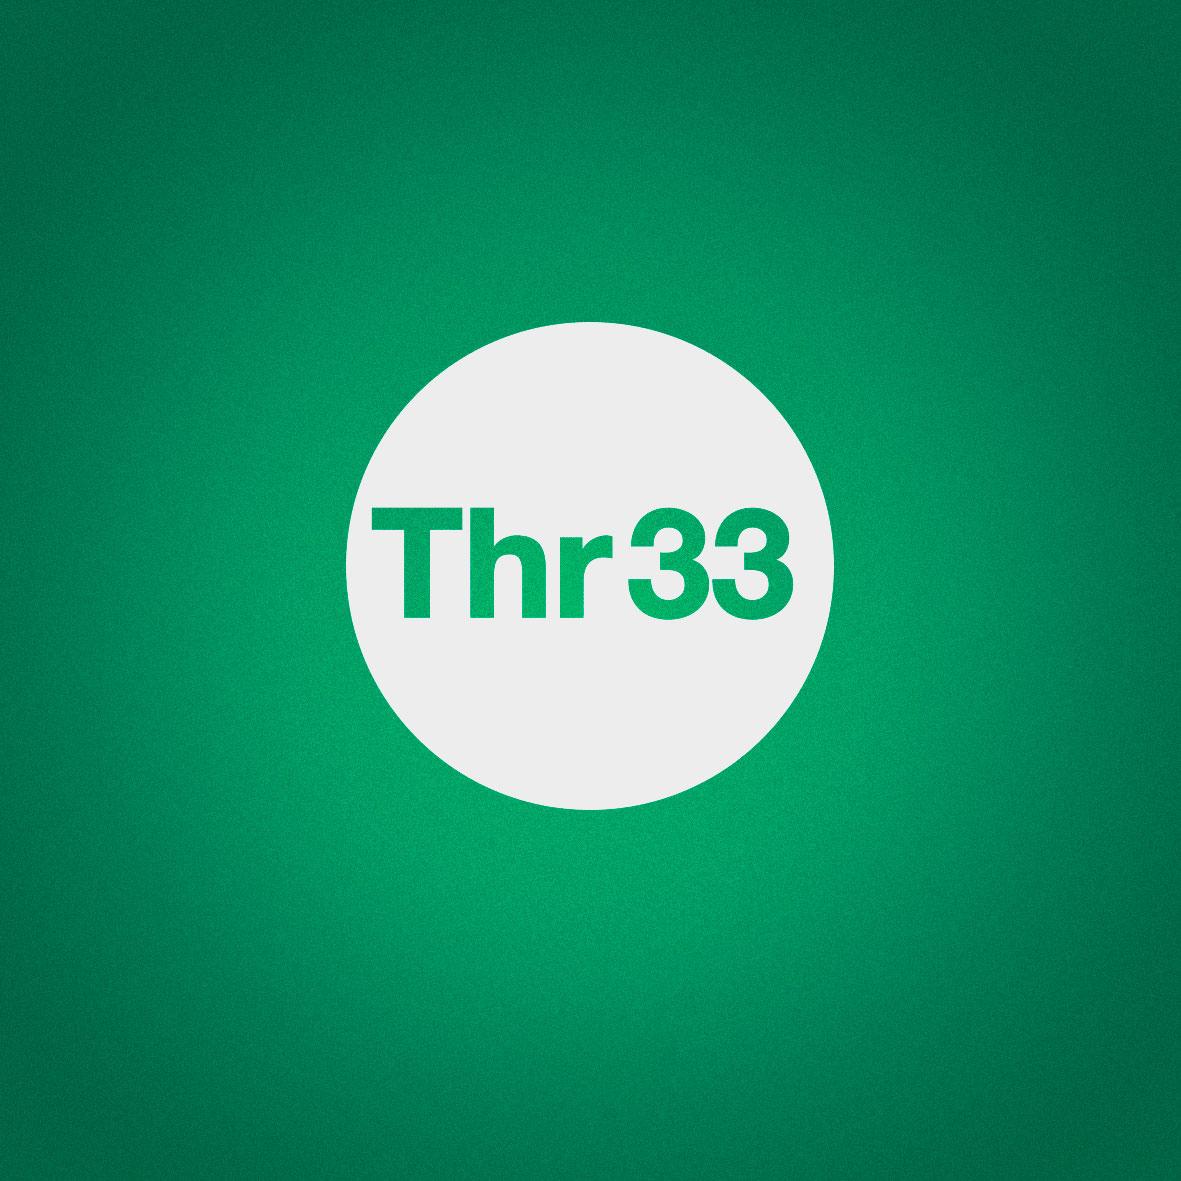 Thr33 Events